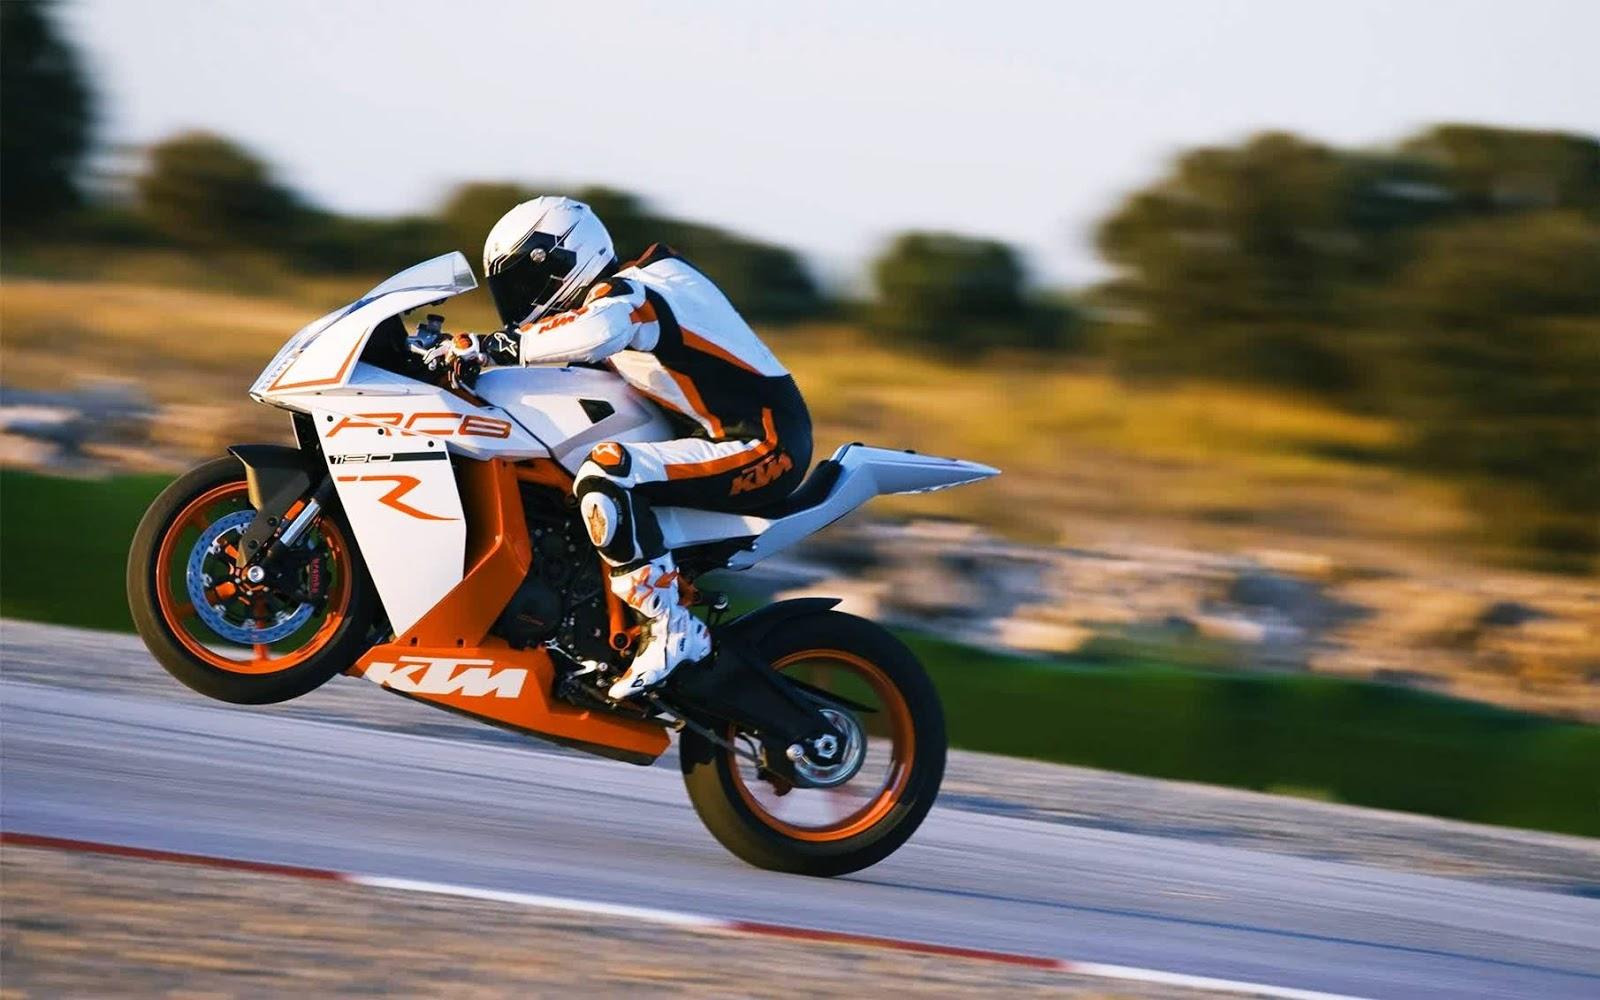 Gambar foto balap motor dengan teknik panning